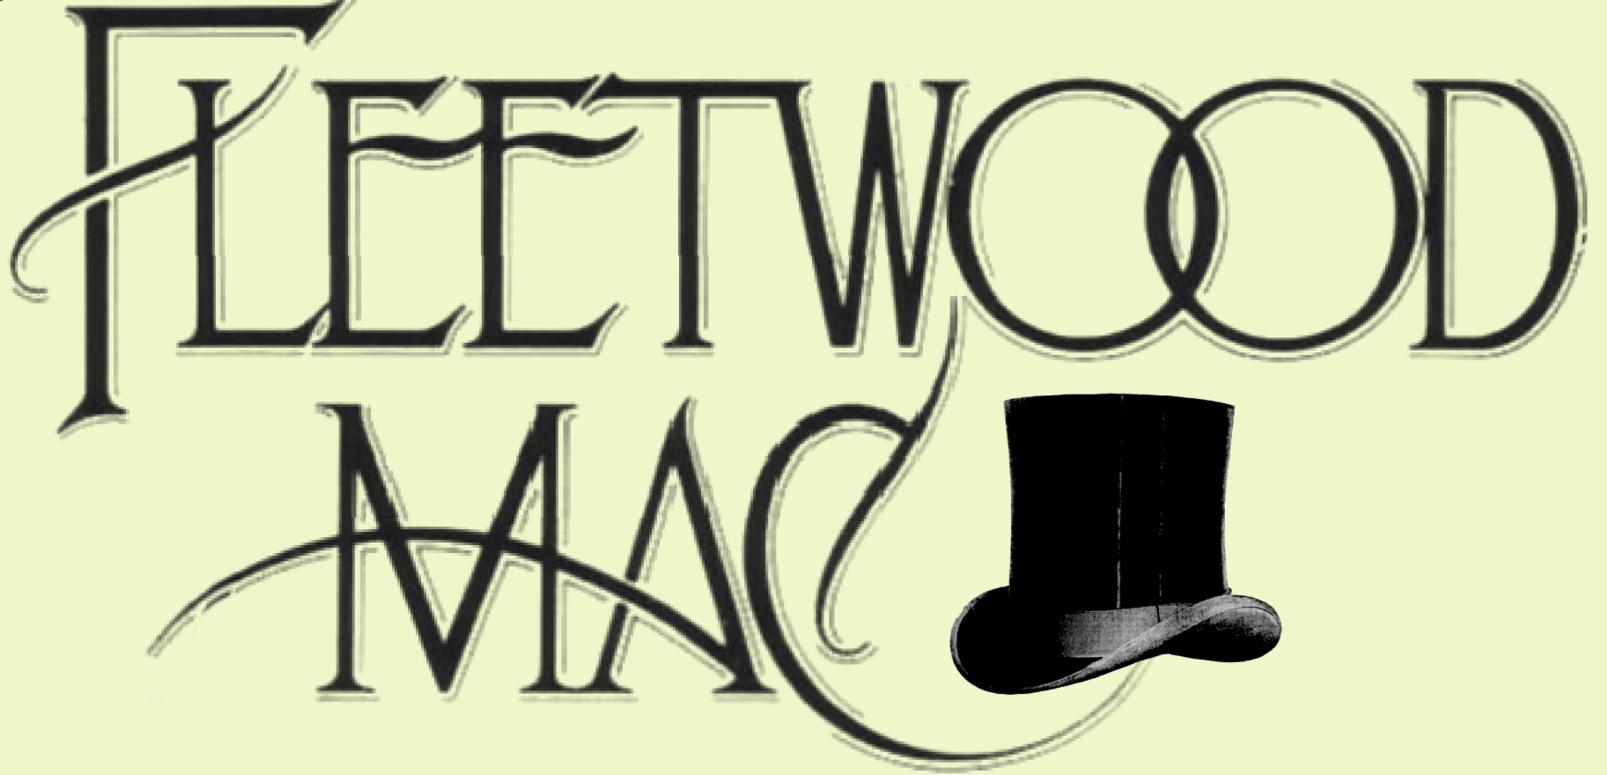 SECOND HAND NEWS FLEETWOOD MAC TRIBUTE BAND